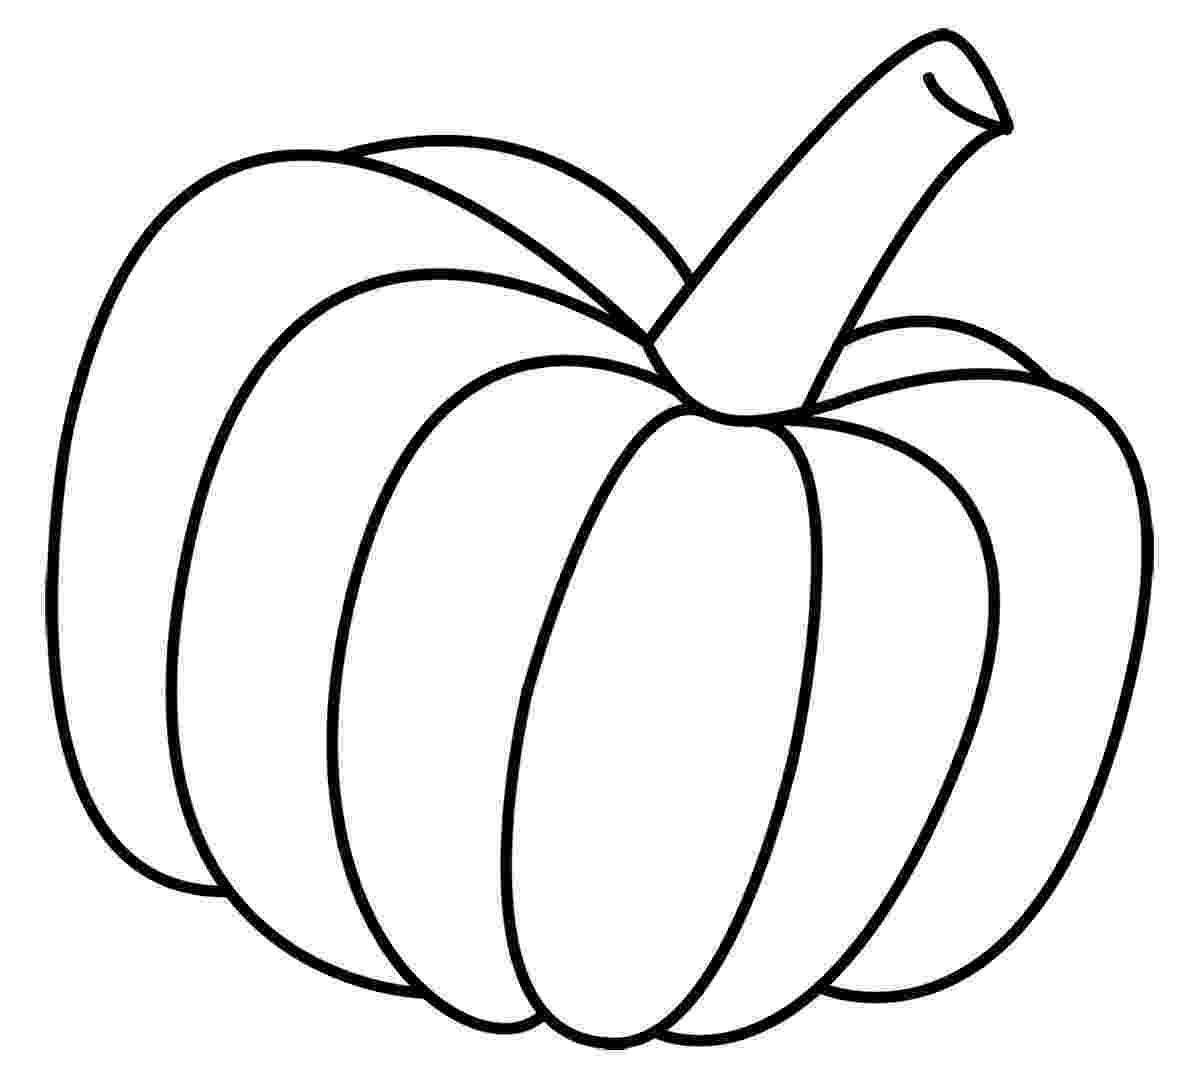 pumpkin color pages printable free printable pumpkin coloring pages for kids cool2bkids color pumpkin printable pages